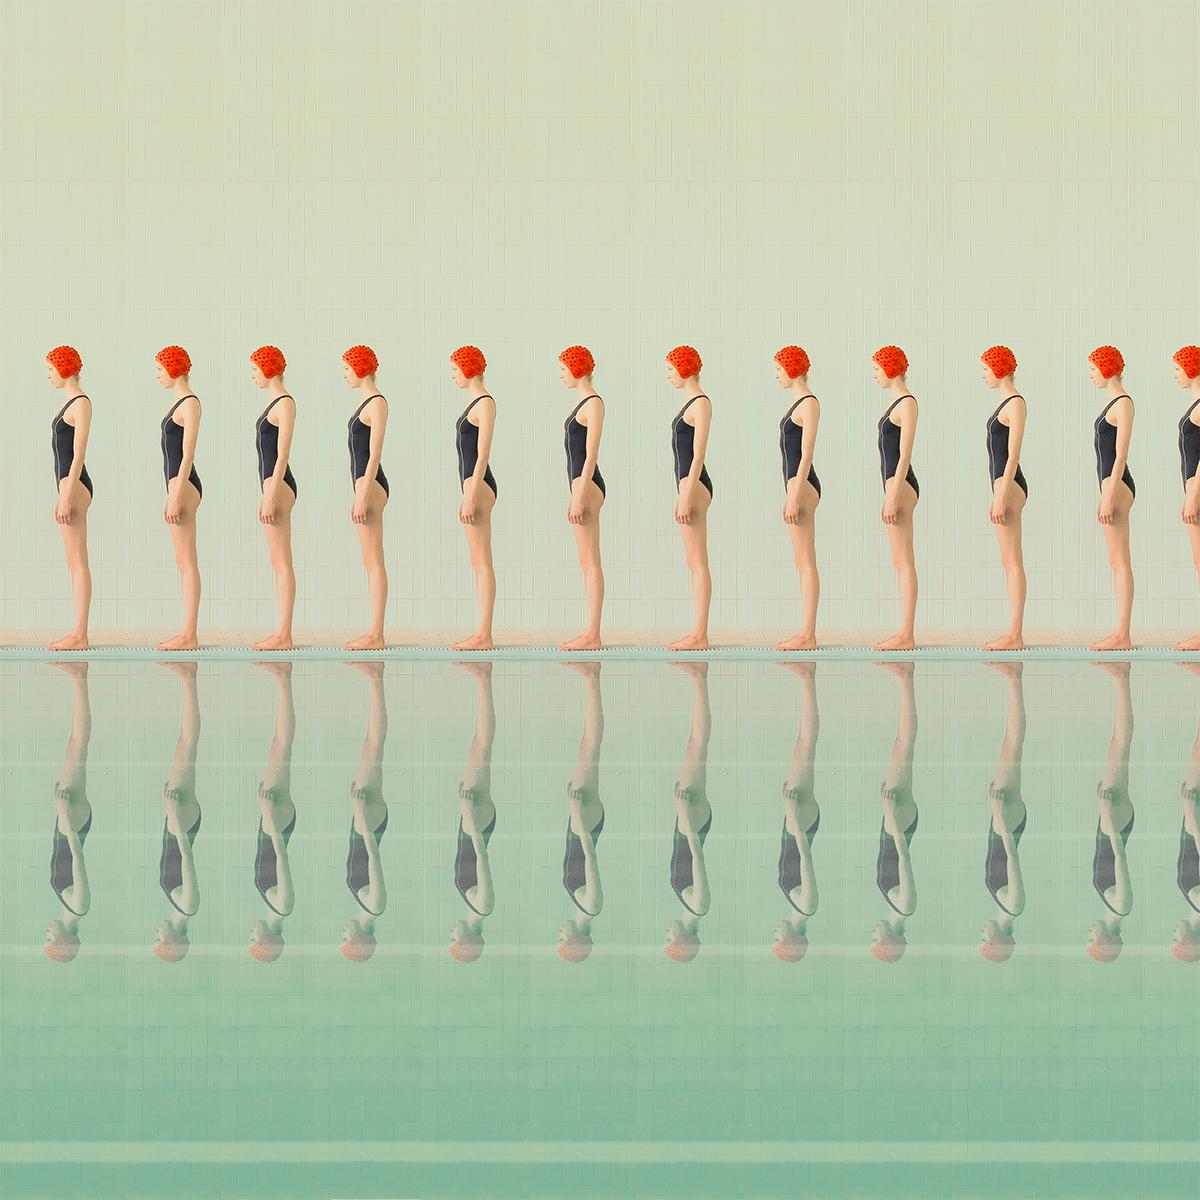 New Swimming Pool Series by Maria Svarbova